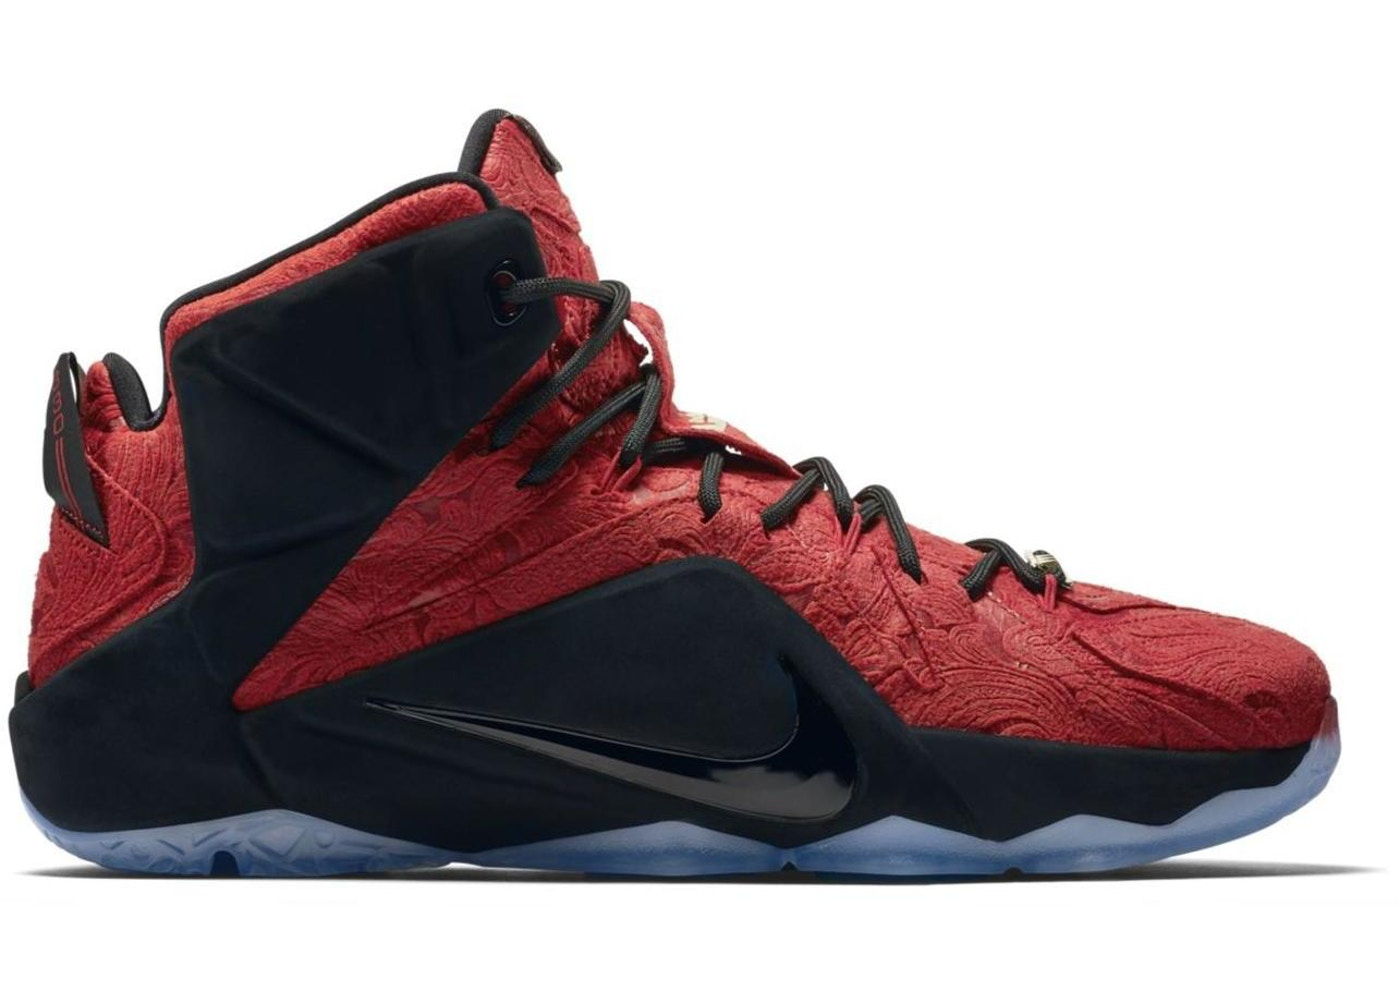 ba2f4a79fa55 Buy Nike LeBron 12 Shoes   Deadstock Sneakers